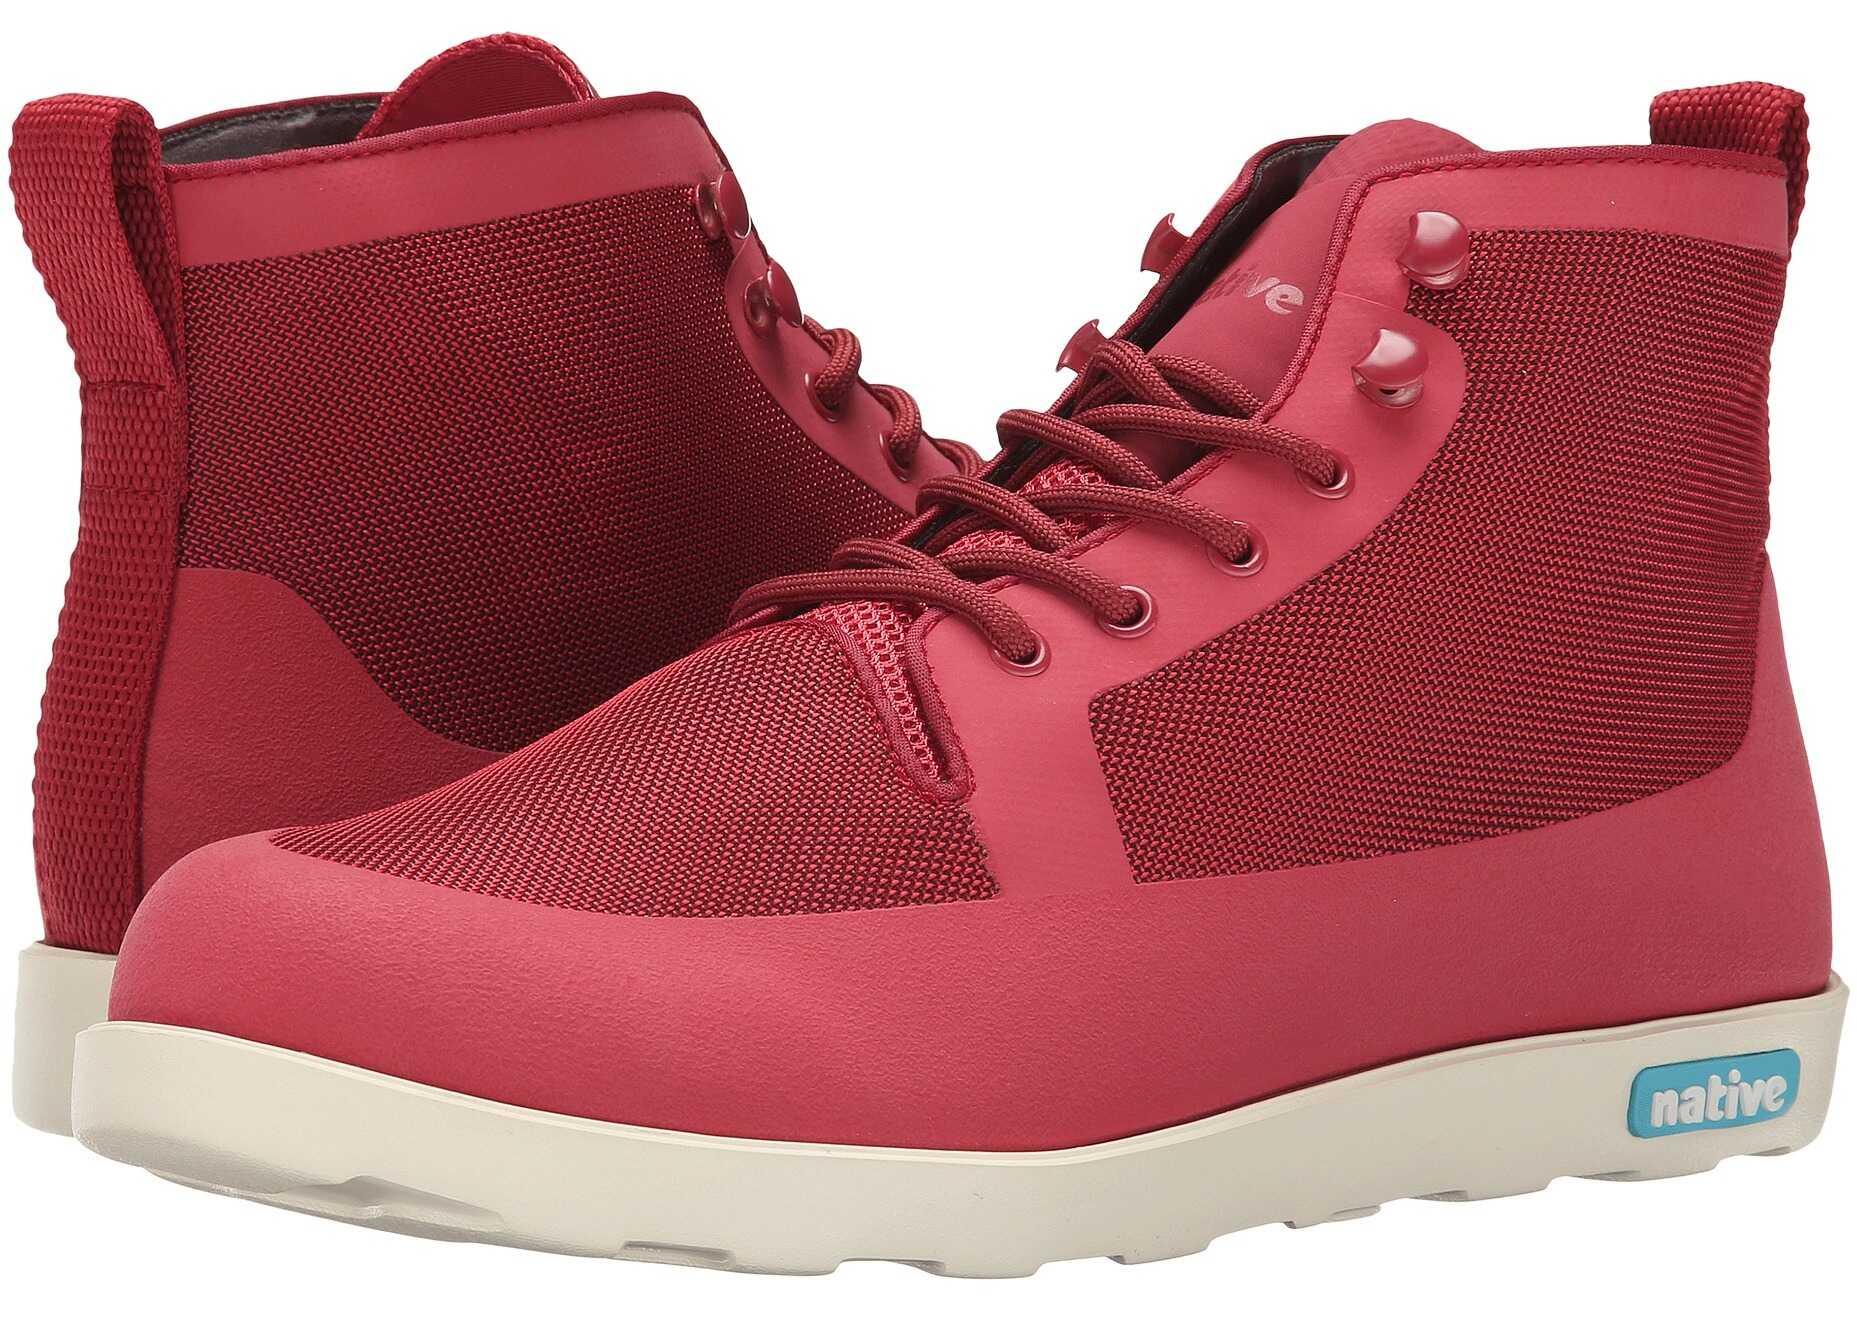 Ghete Barbati Native Shoes Fitzroy Fire Truck Red/